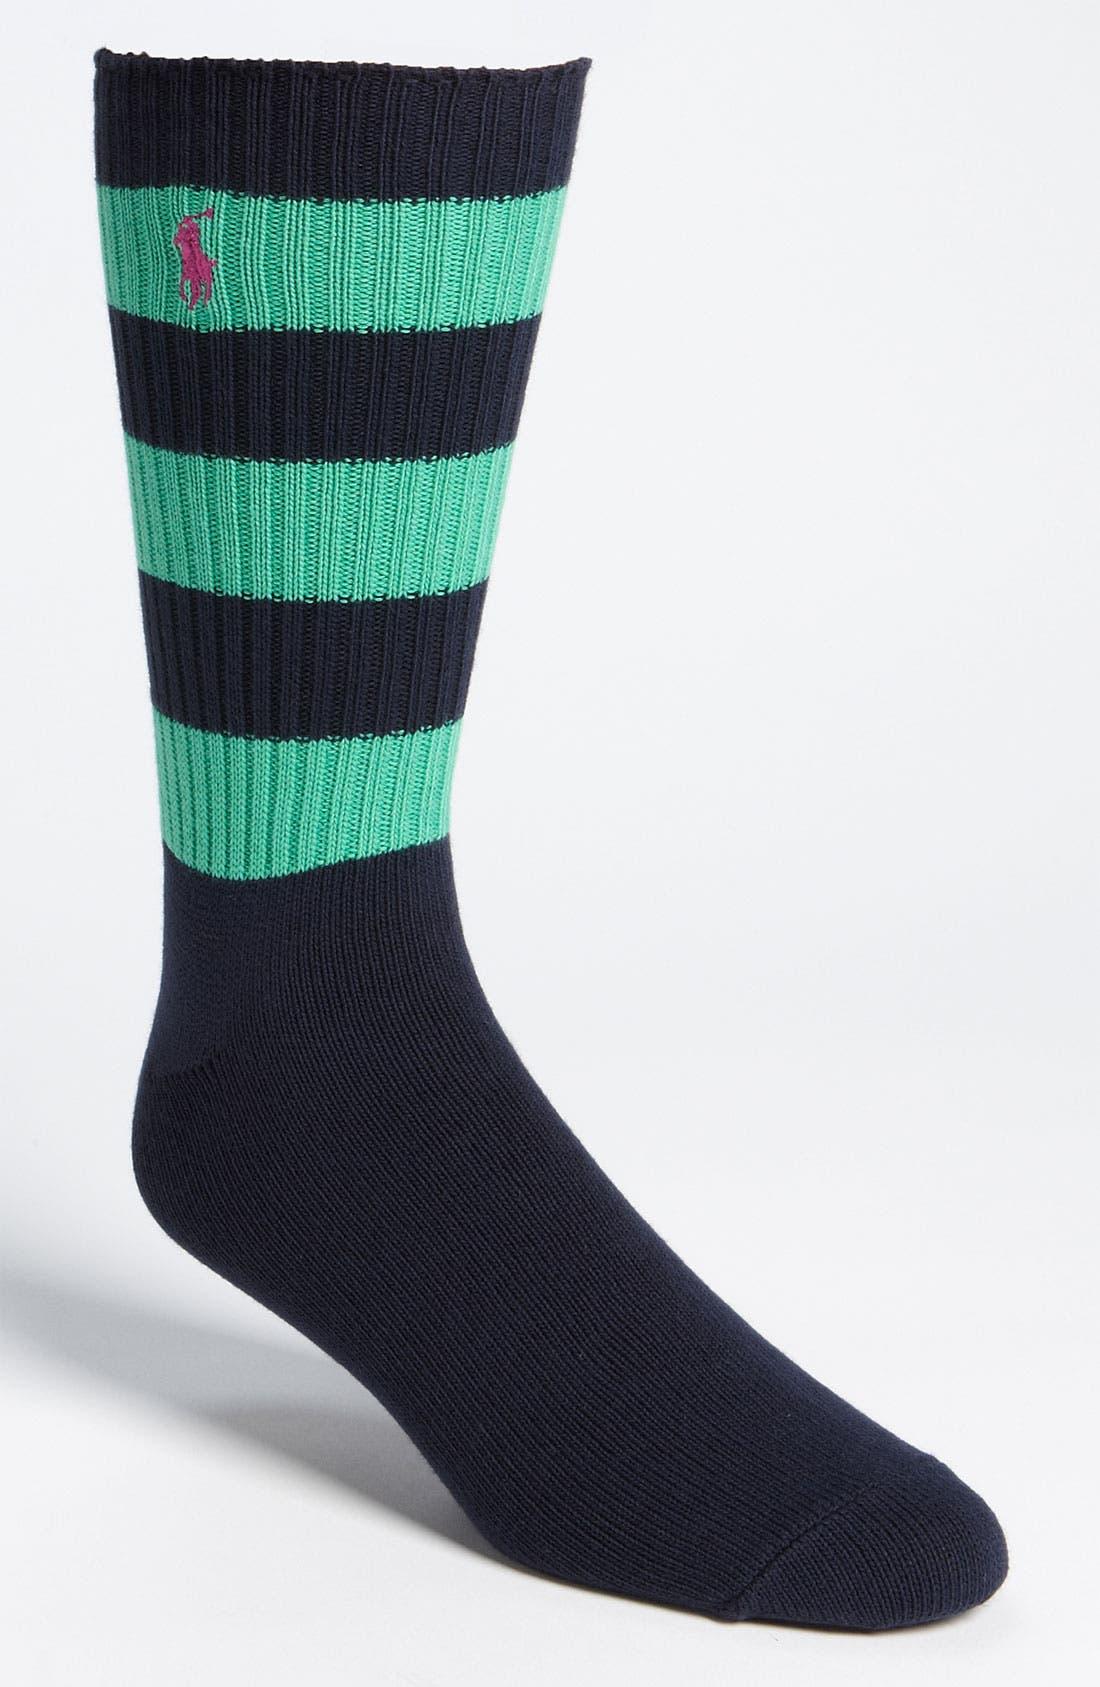 Main Image - Polo Ralph Lauren 'Blazer' Crew Socks